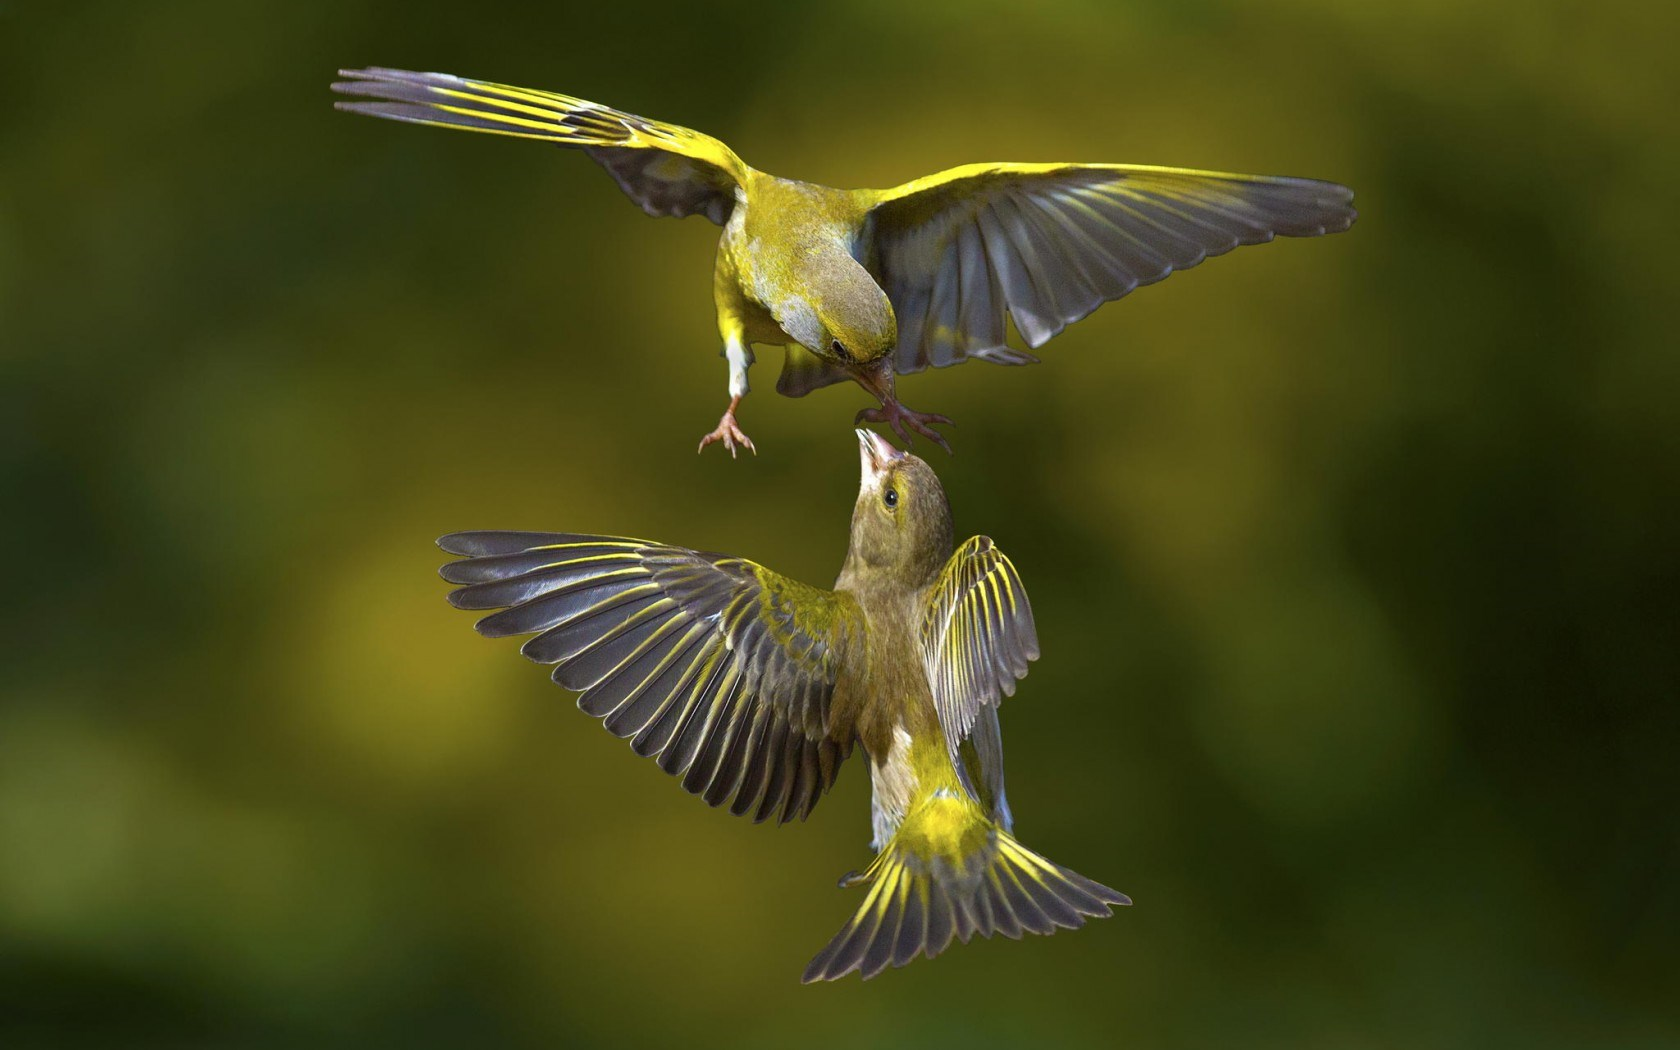 Bird Nature Fly